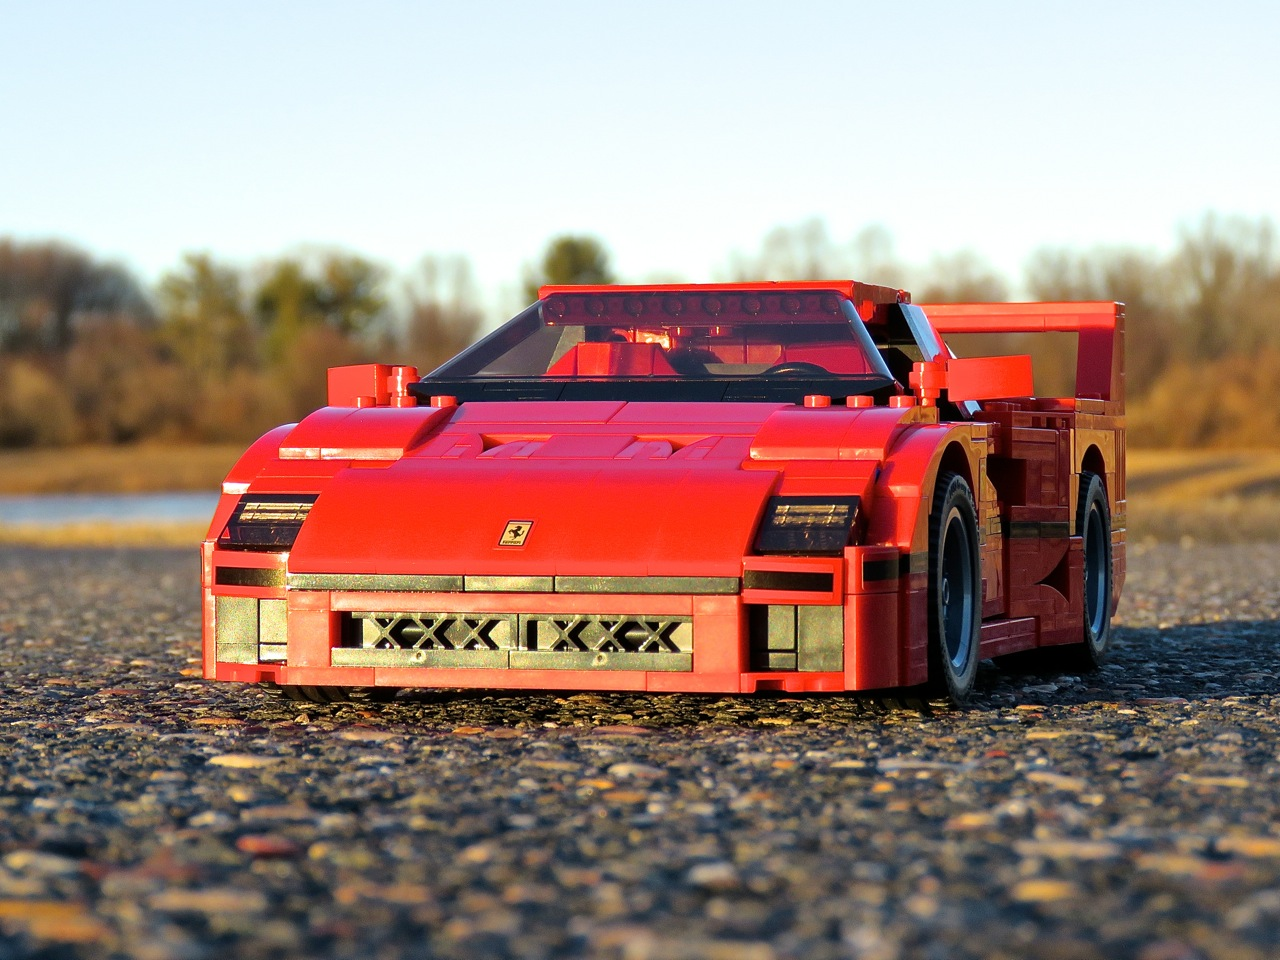 Lego Ferrari F40 7